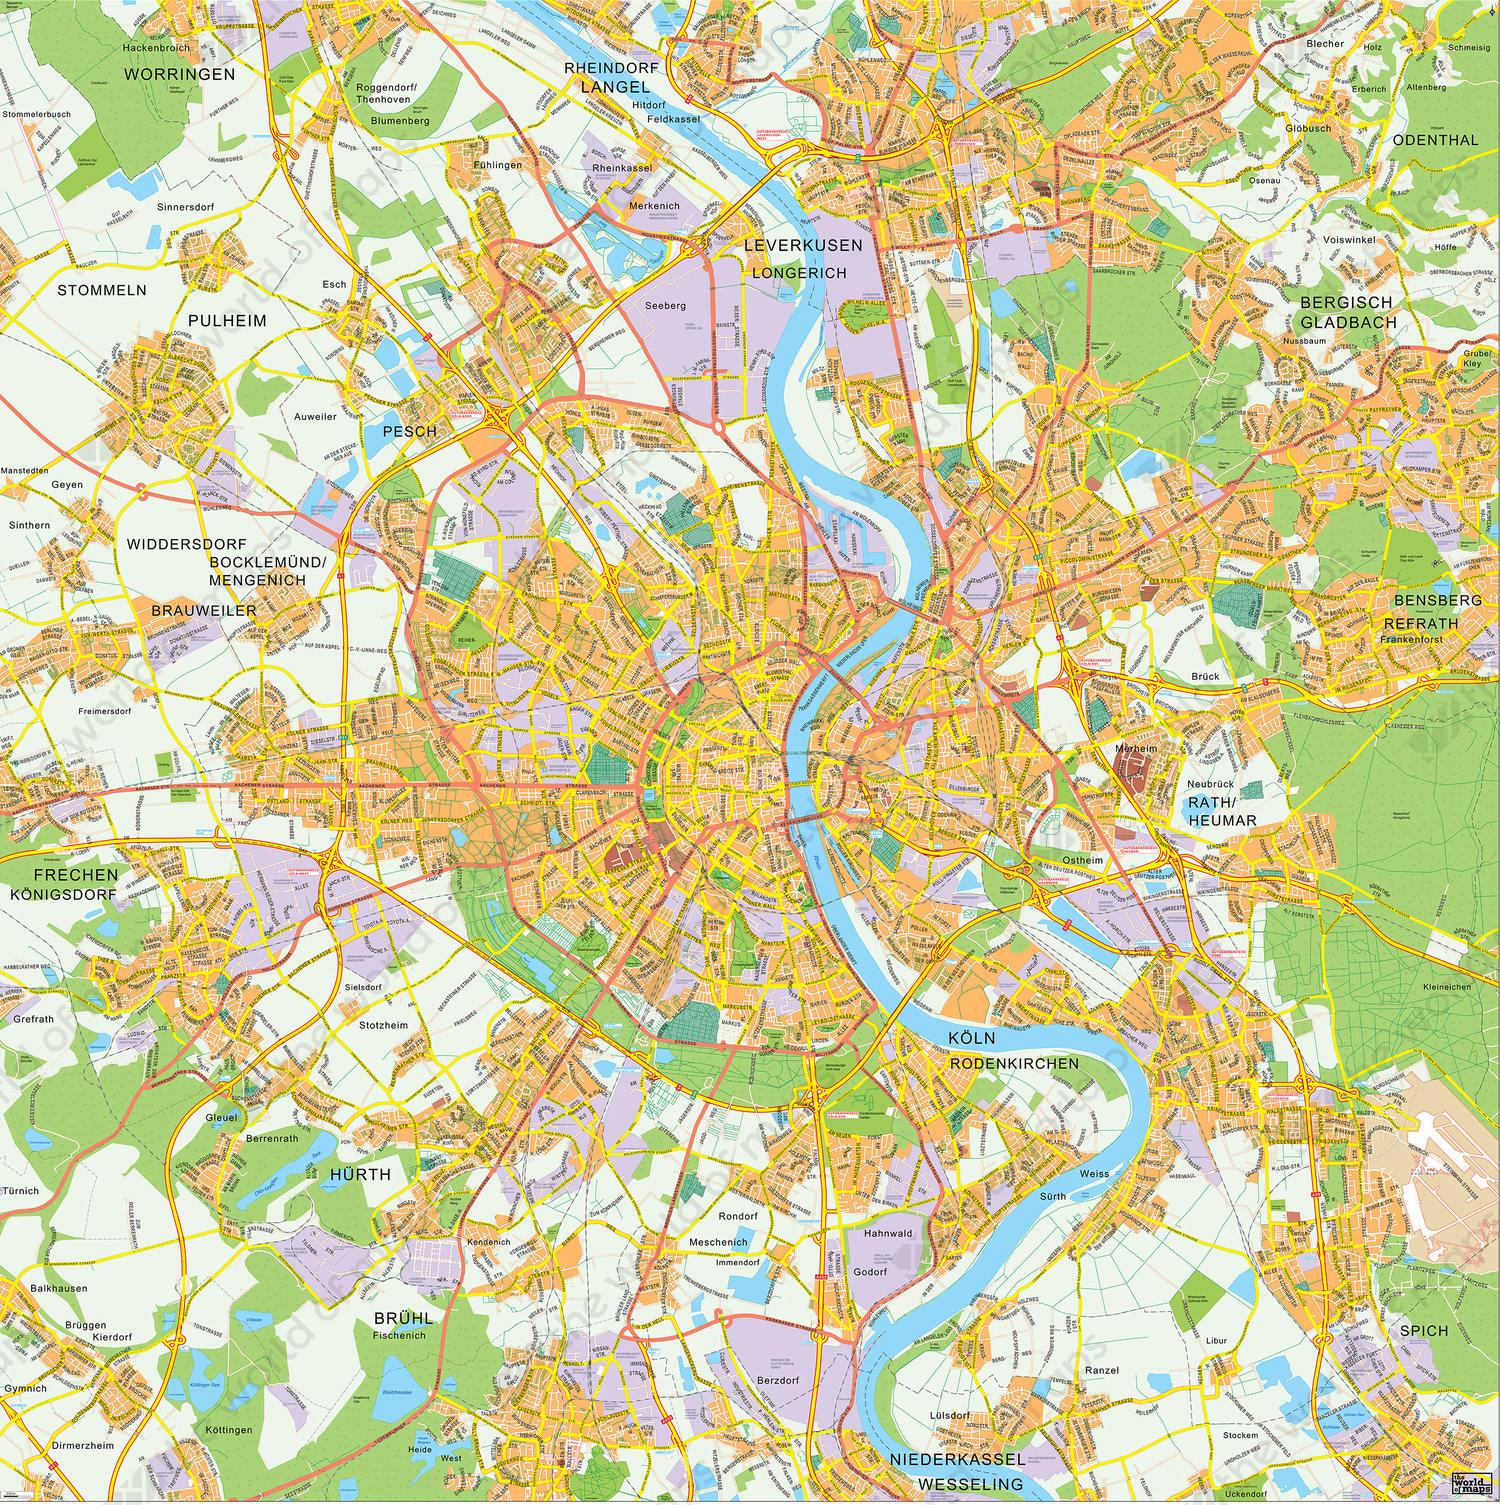 Digital City Map Cologne 141 The World of Mapscom